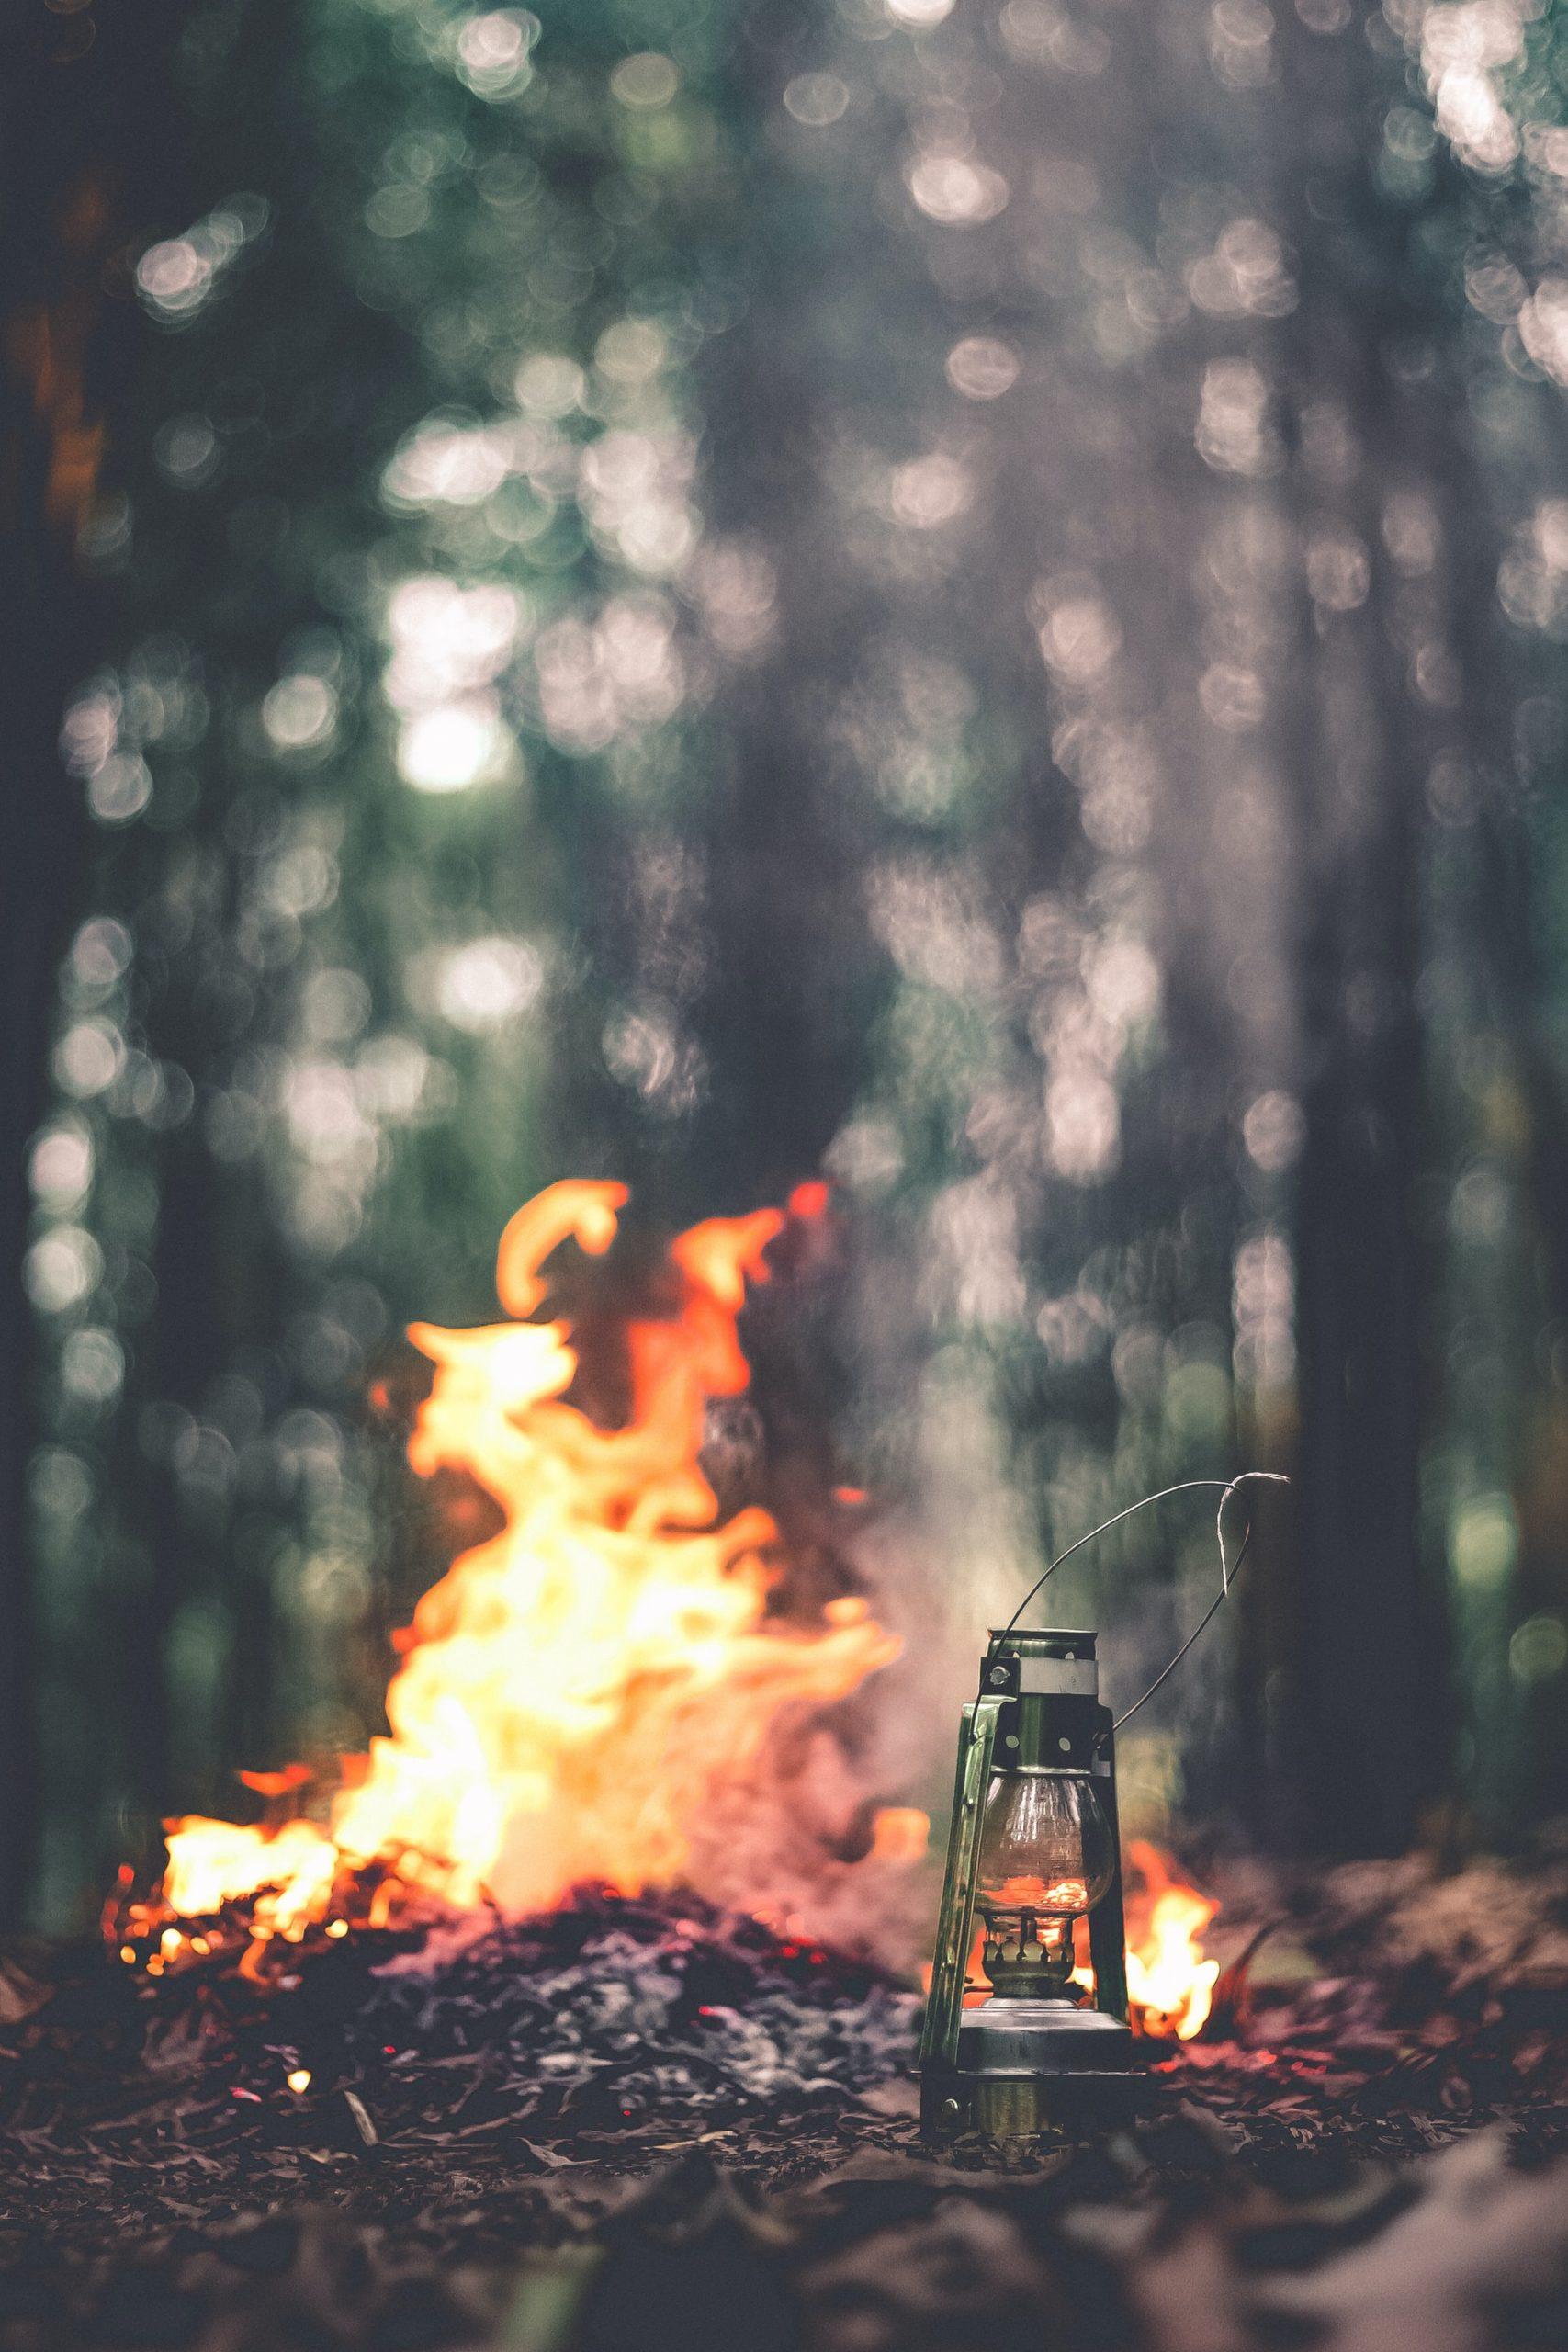 frankreich-campingplätze-lagerfeuer